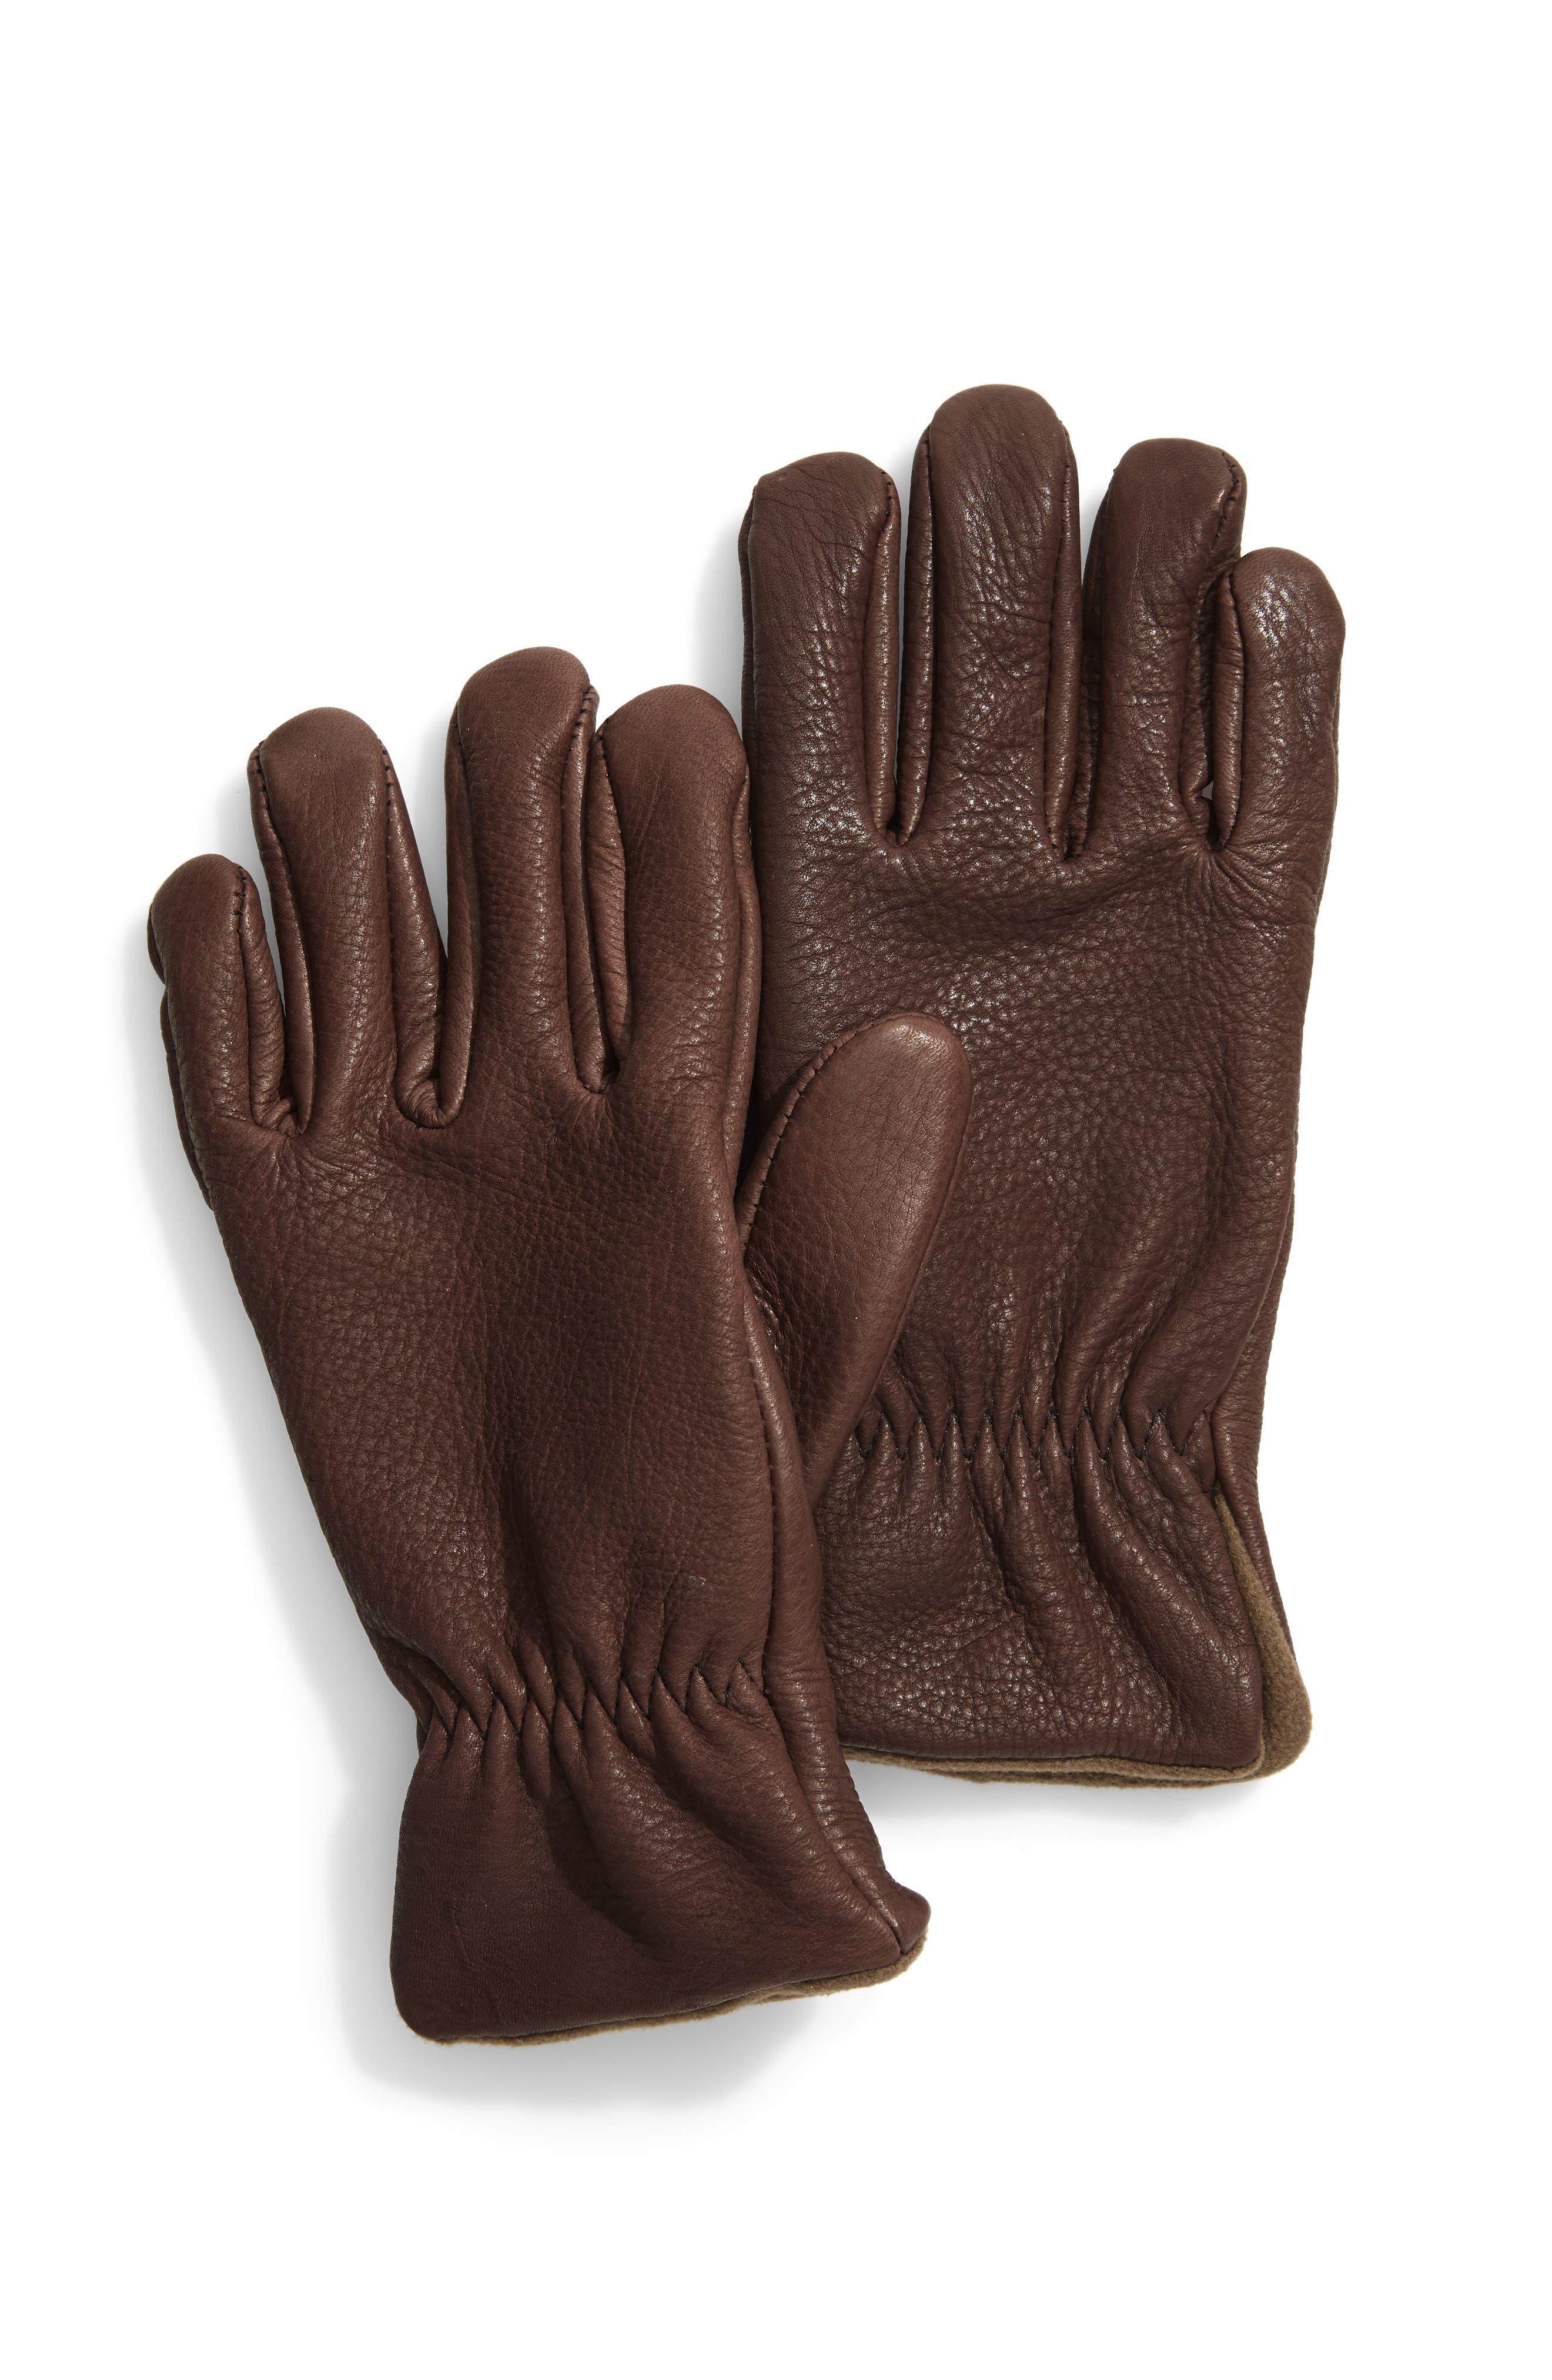 Roper Lined Deerskin Gloves,                         Main,                         color, CHOCOLATE